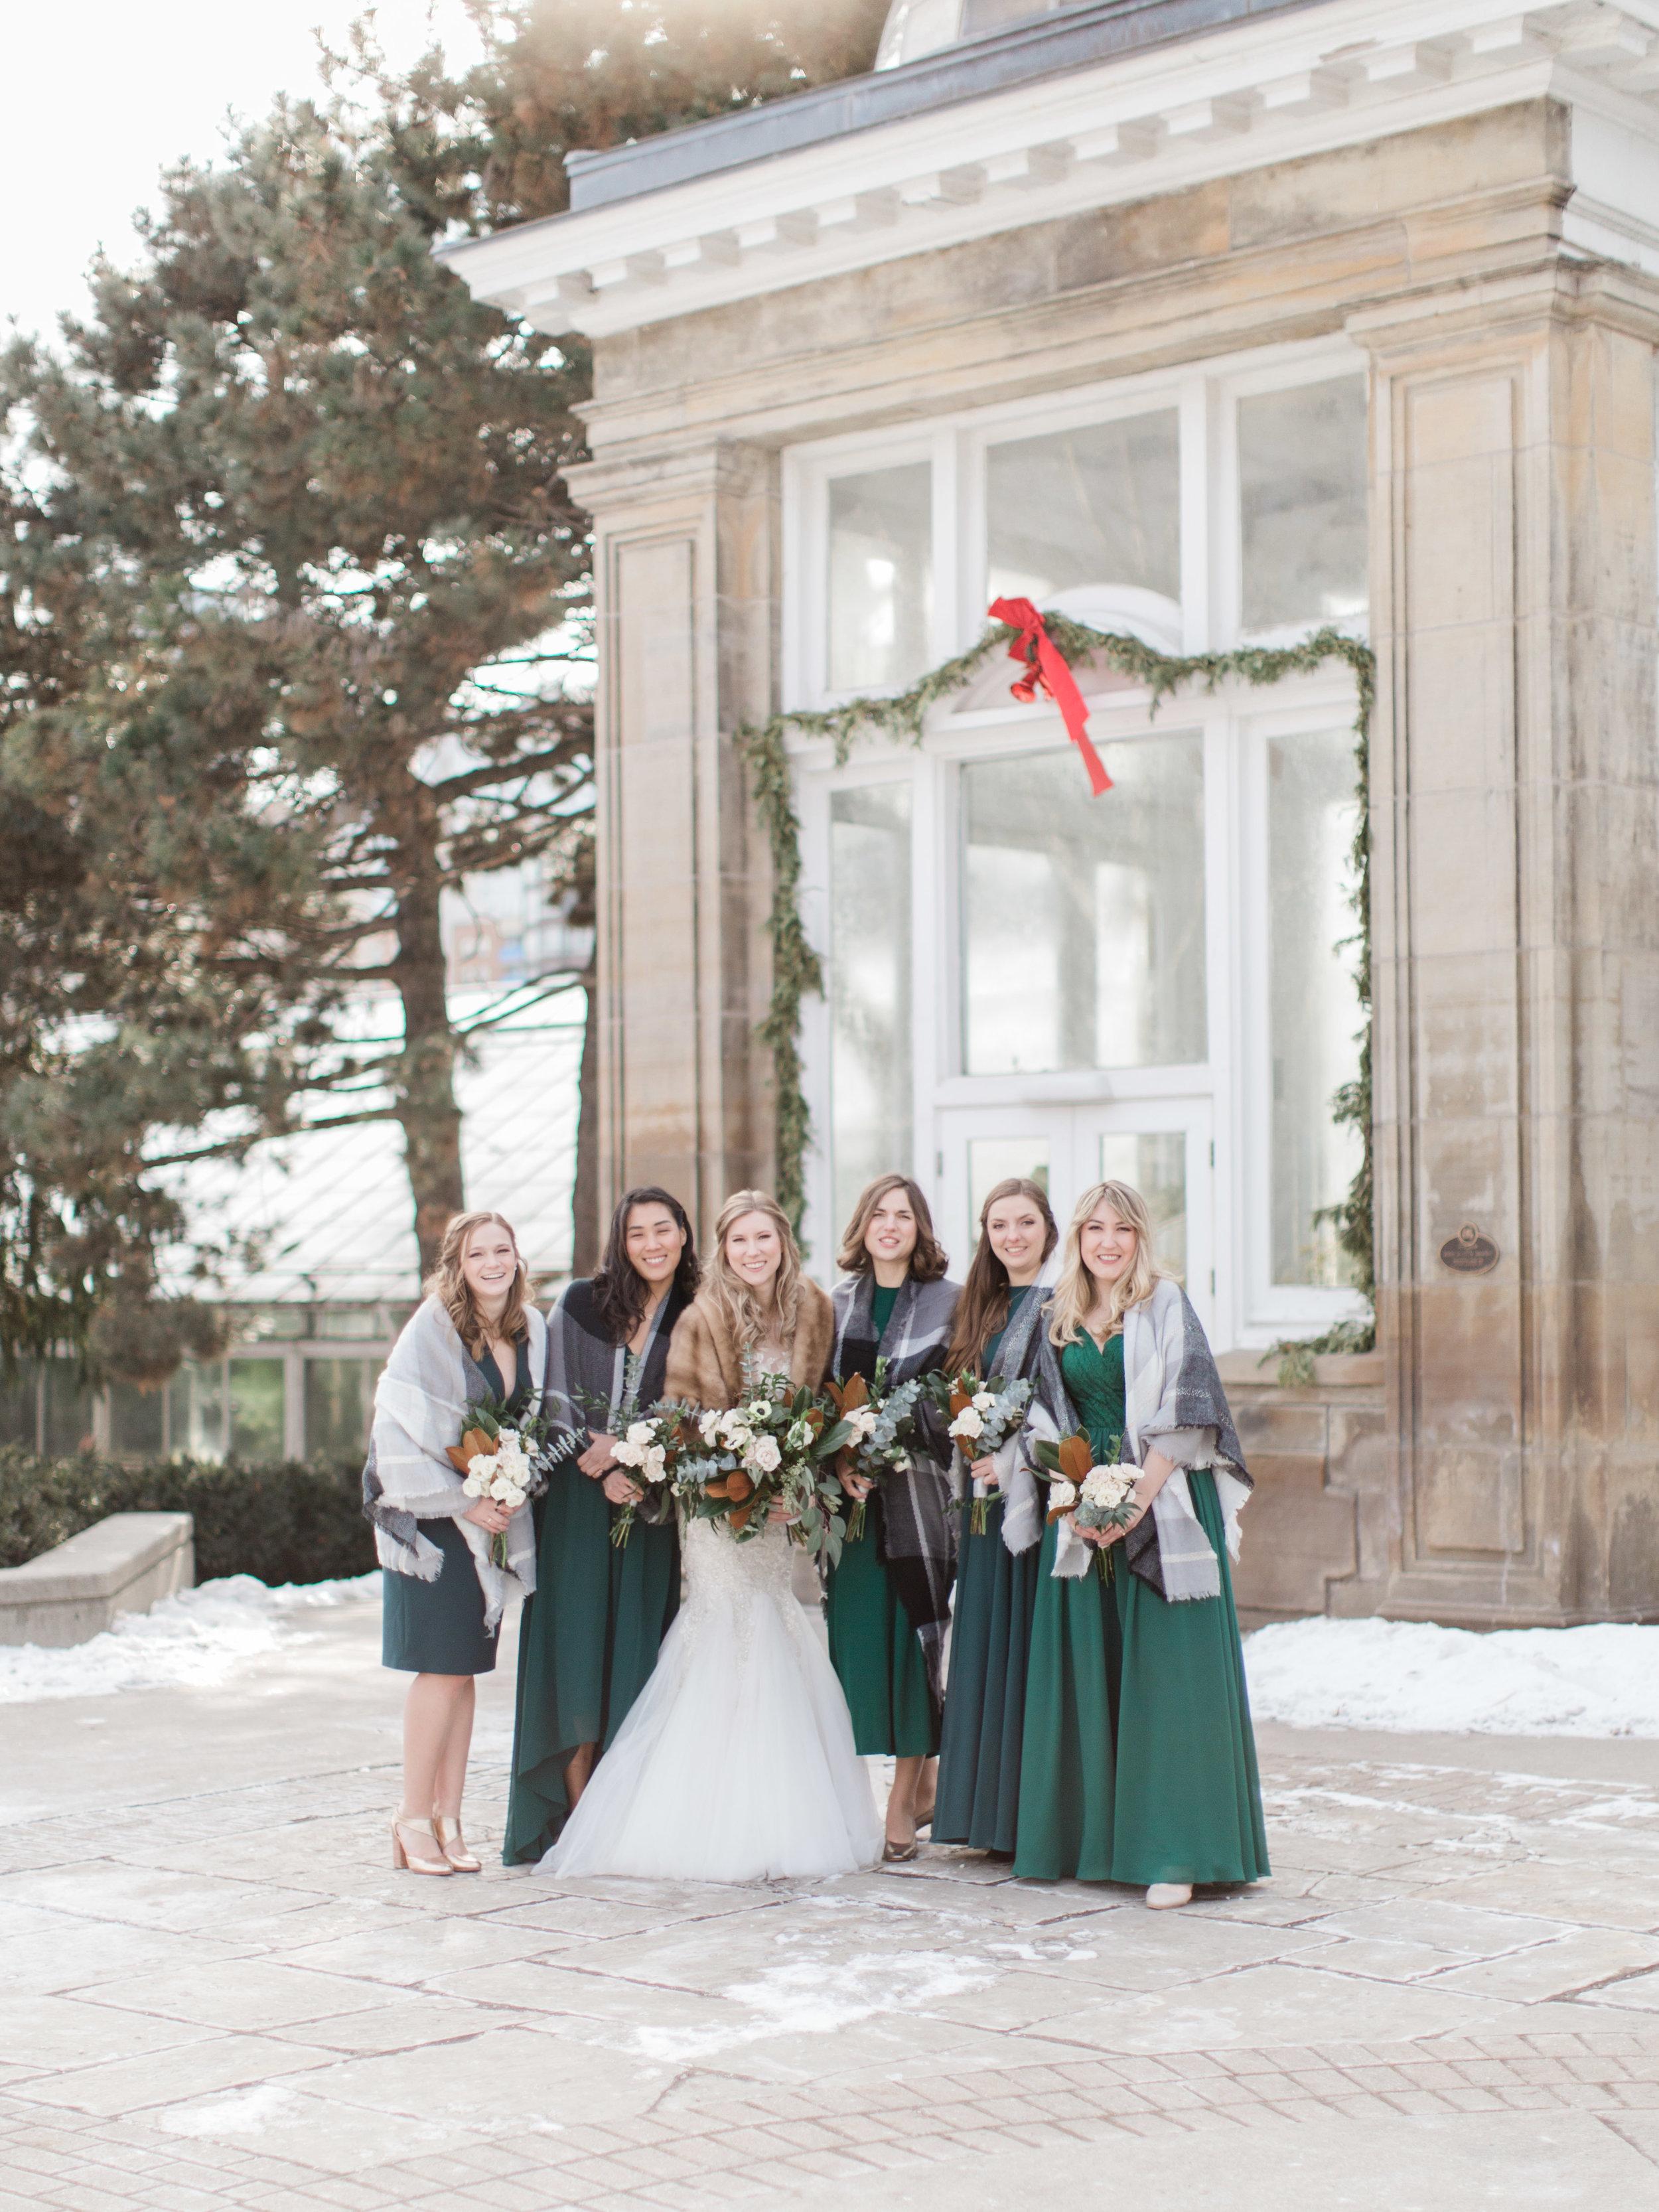 Toronto-wedding-photographer-downtown-winter-wedding-intimate-restaurant-canoe50.jpg